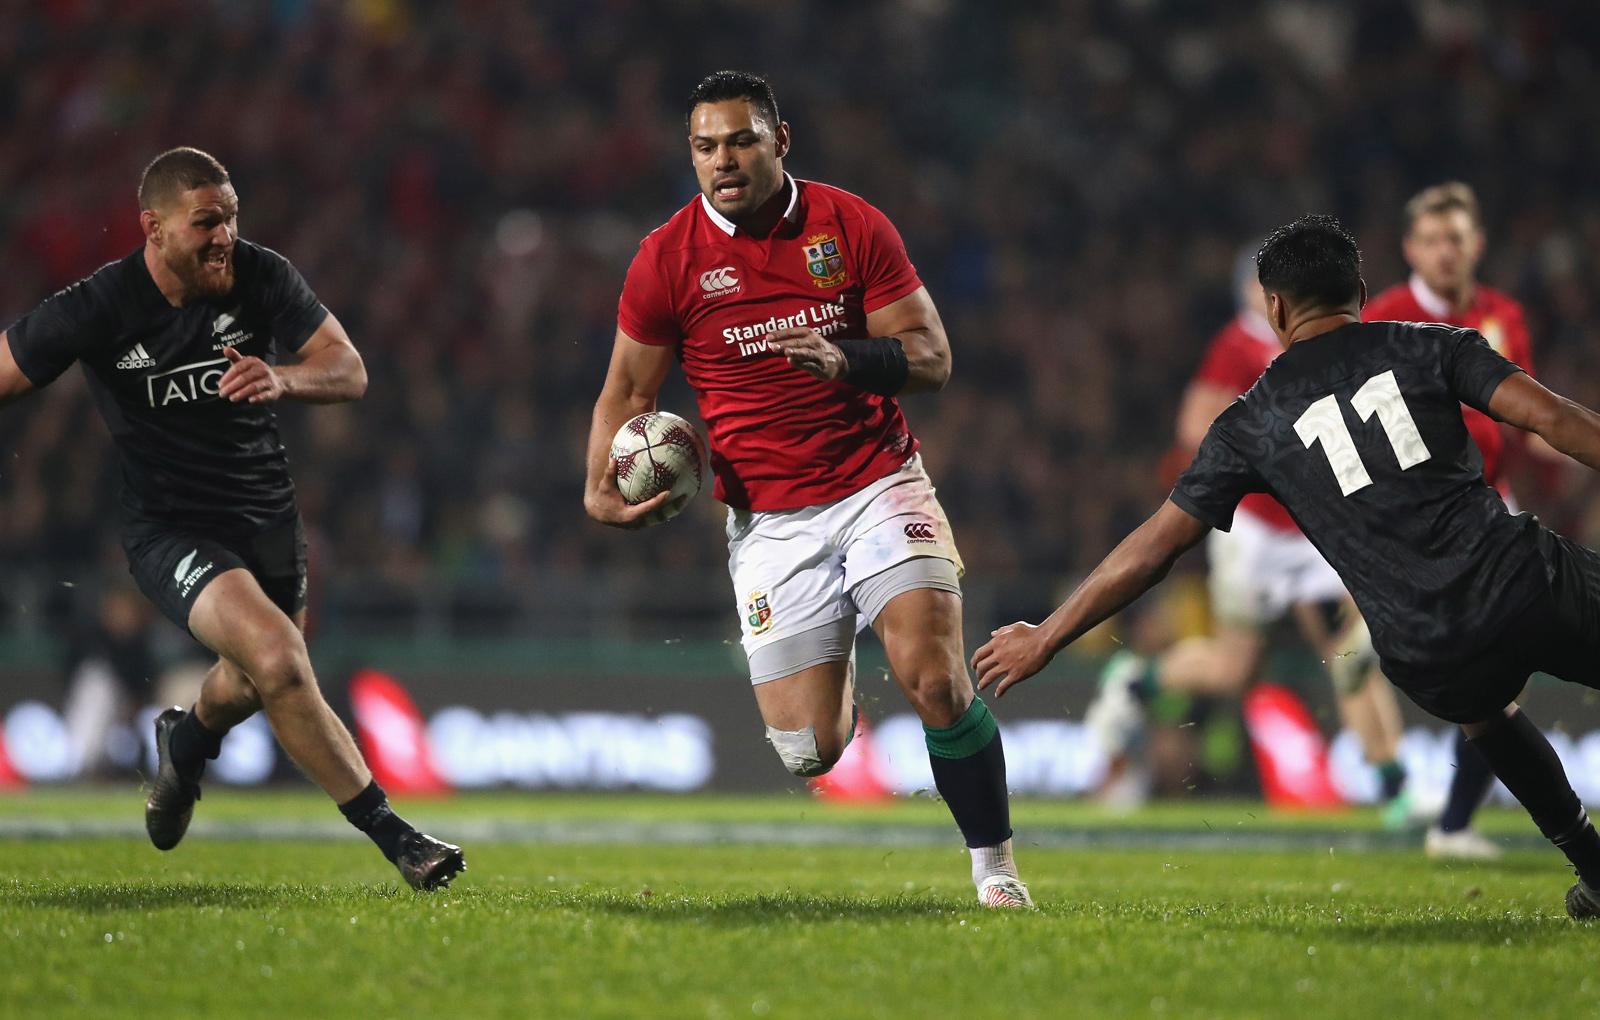 Match Analysis: Maori All Blacks v Lions